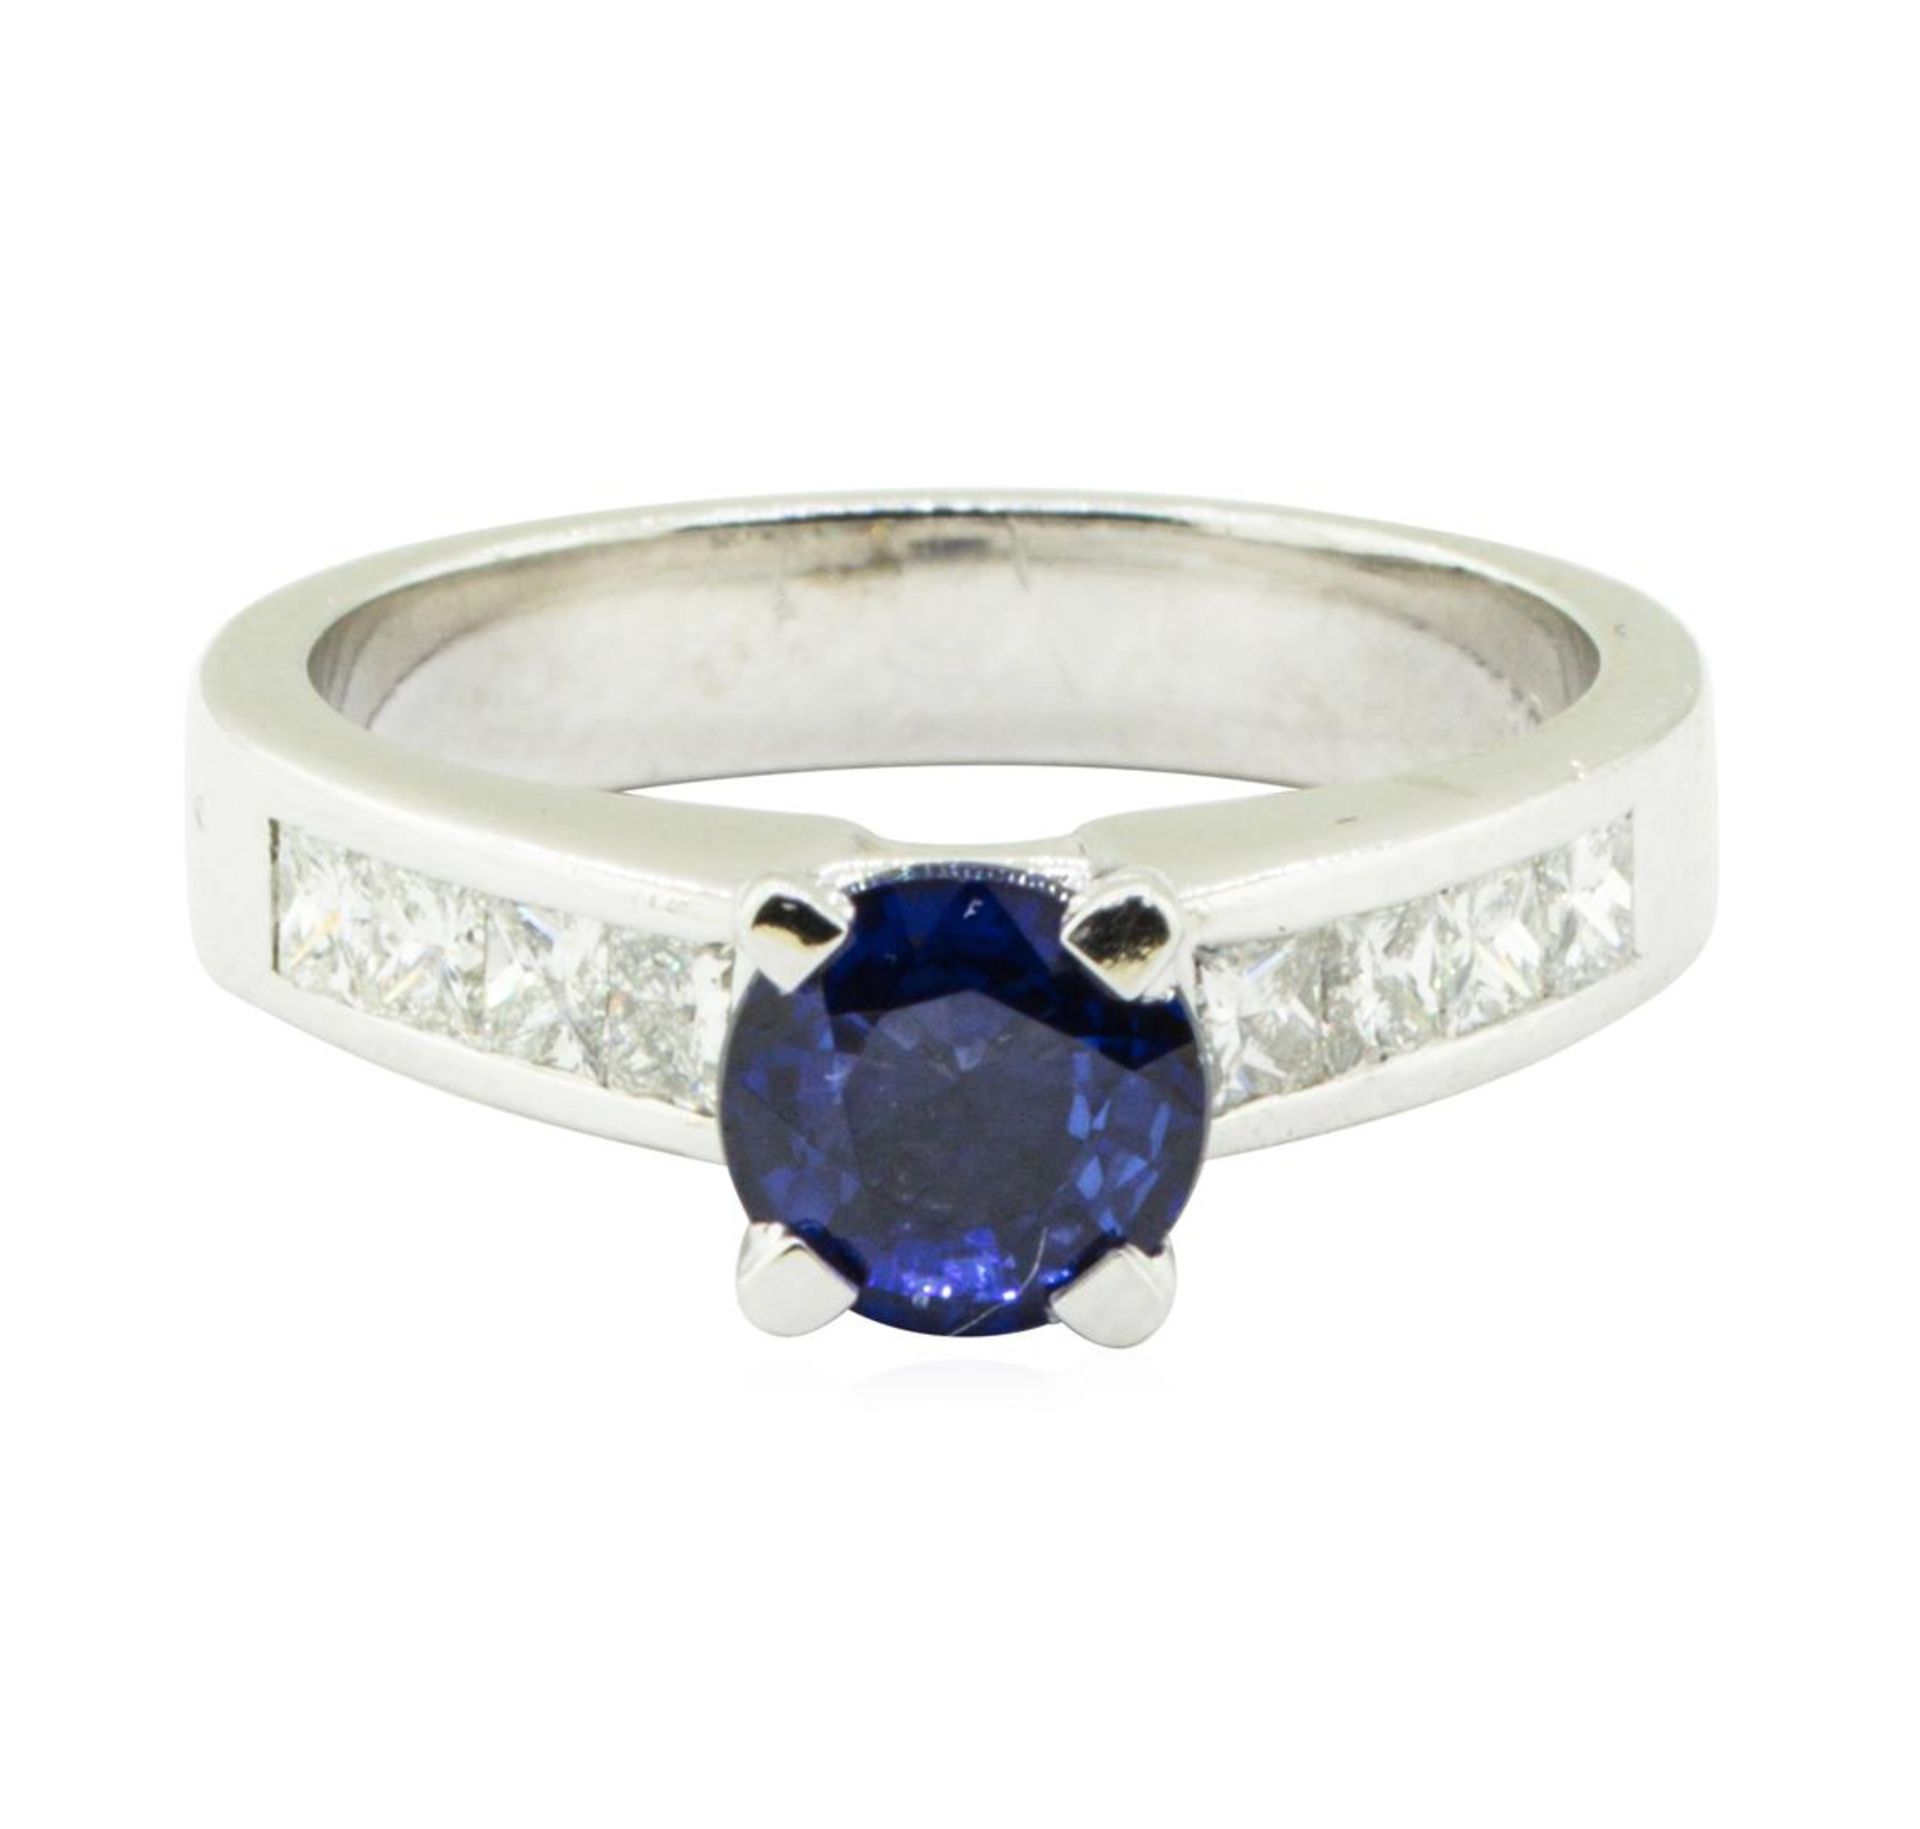 2.01 ctw Round Mixed Blue Sapphire And Diamond Ring - Platinum - Image 2 of 5